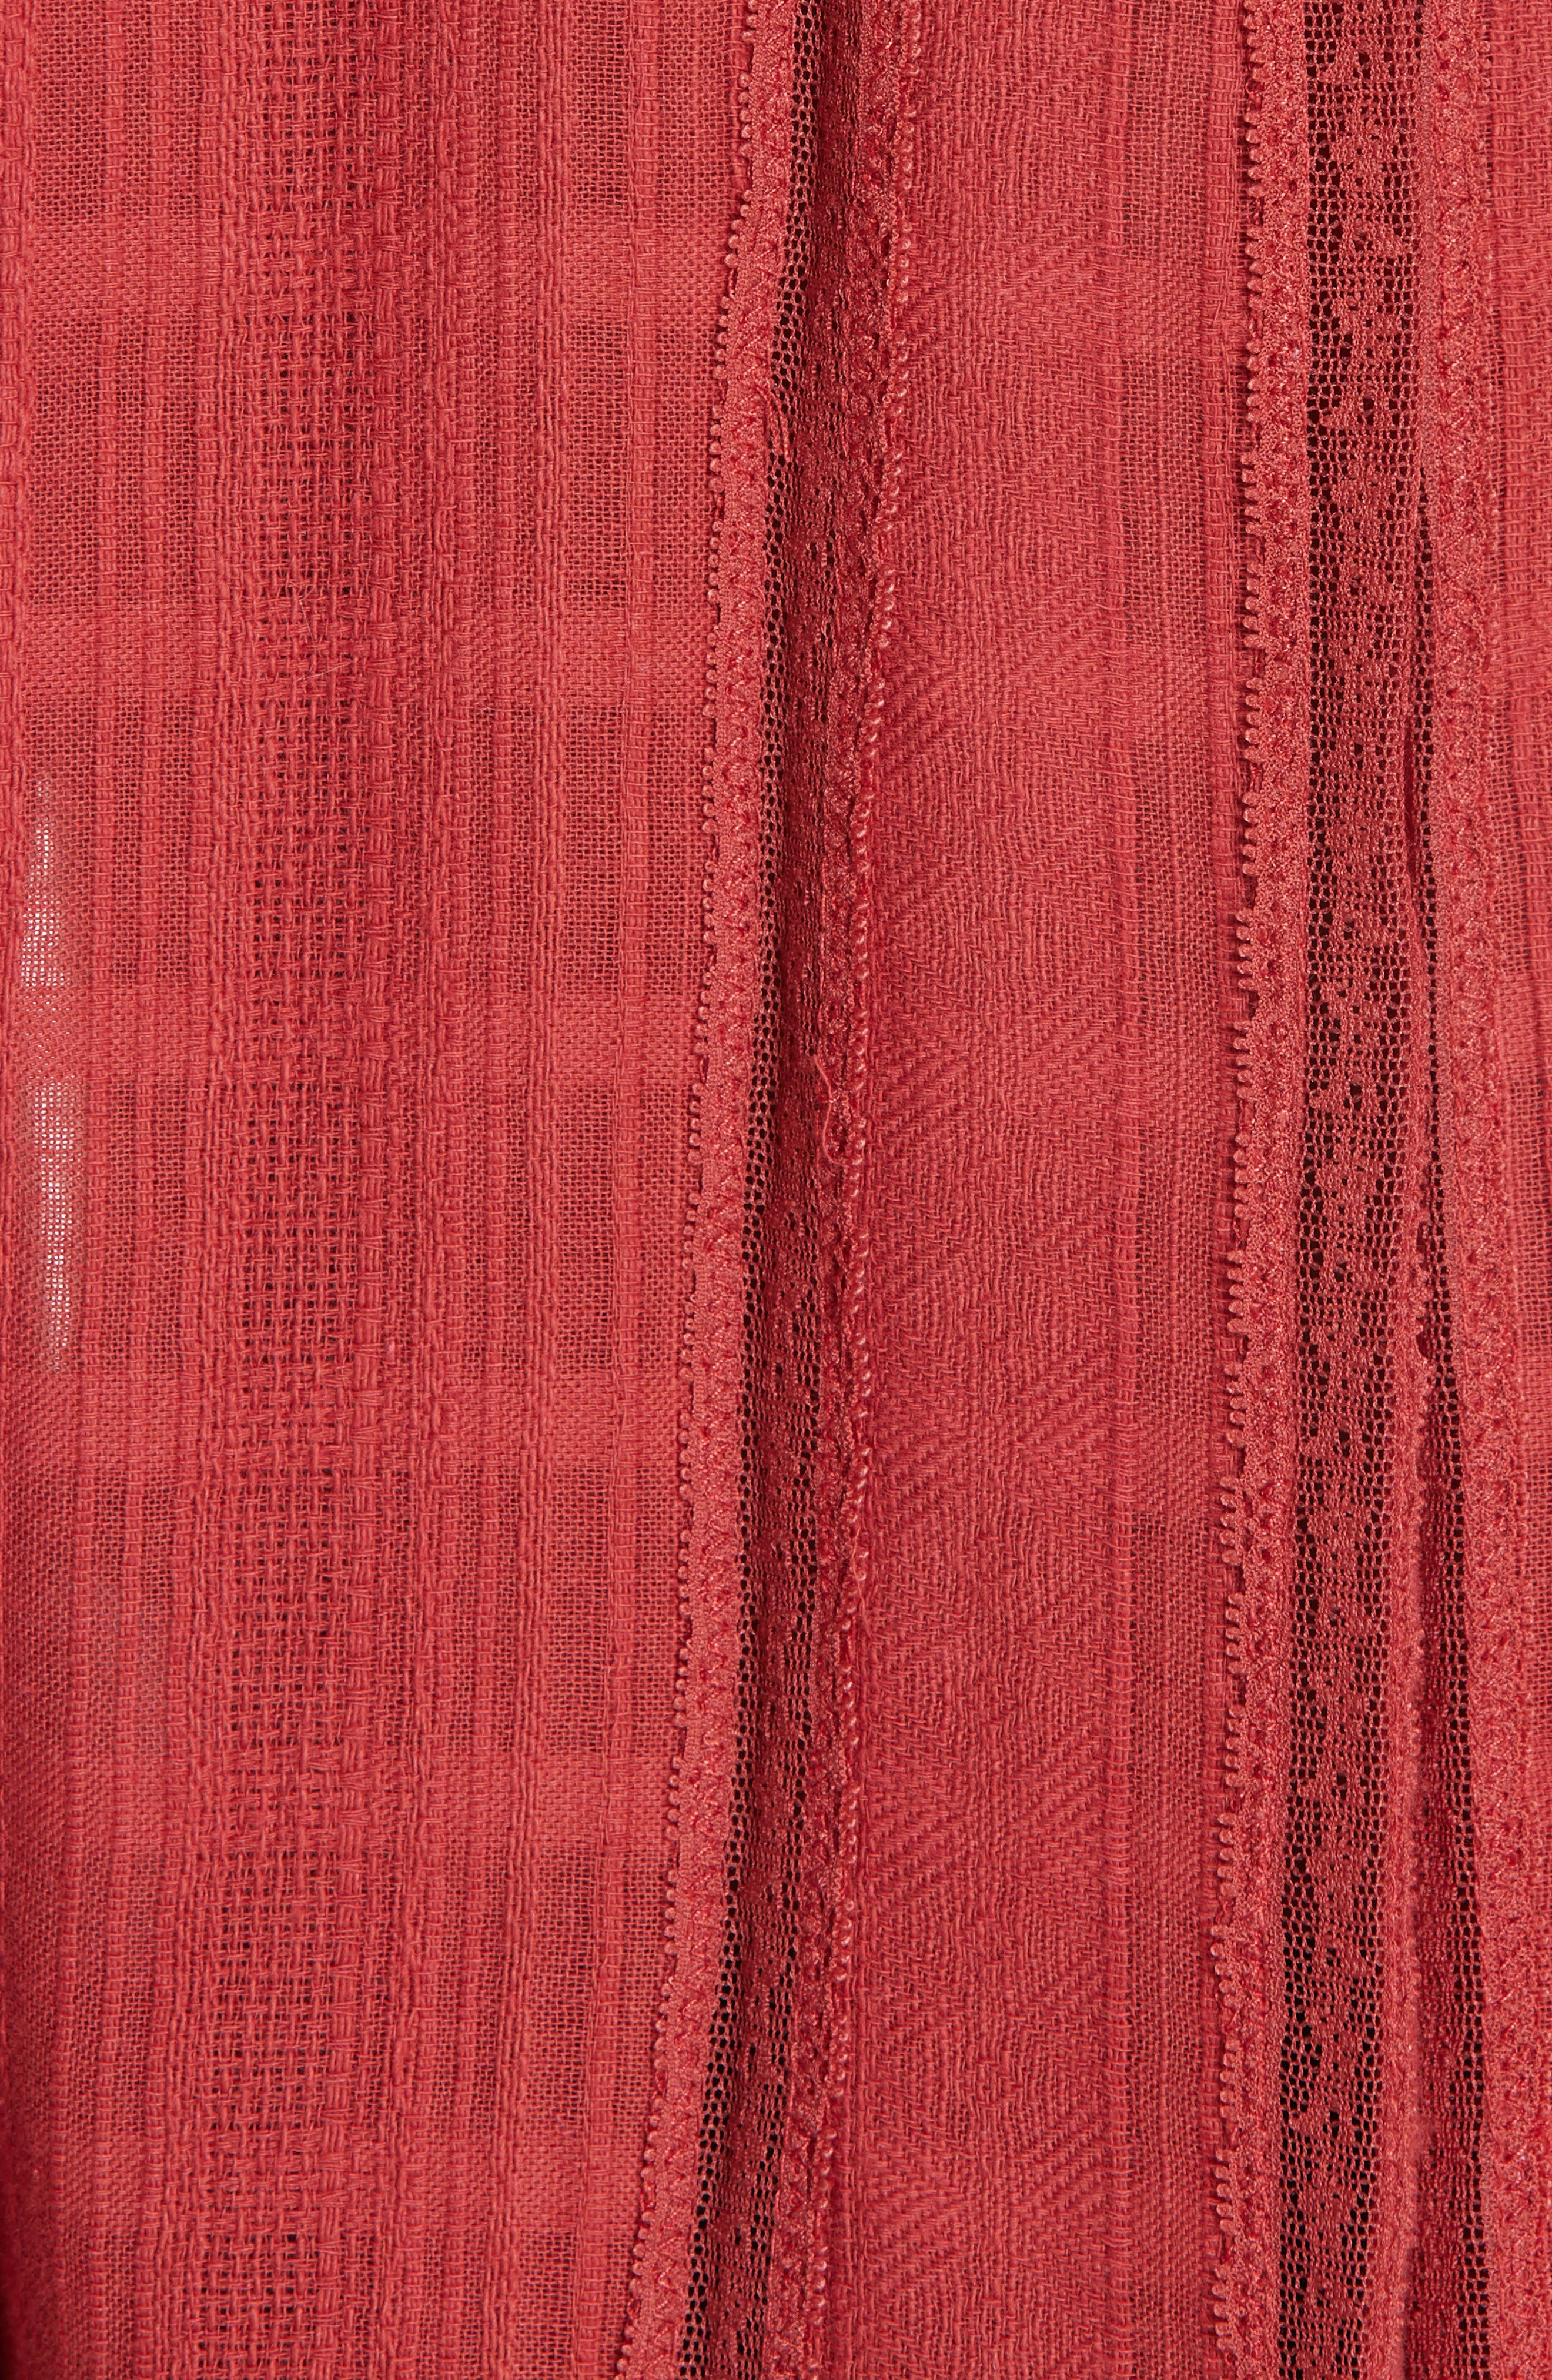 Kalina Cotton Blouse,                             Alternate thumbnail 5, color,                             612